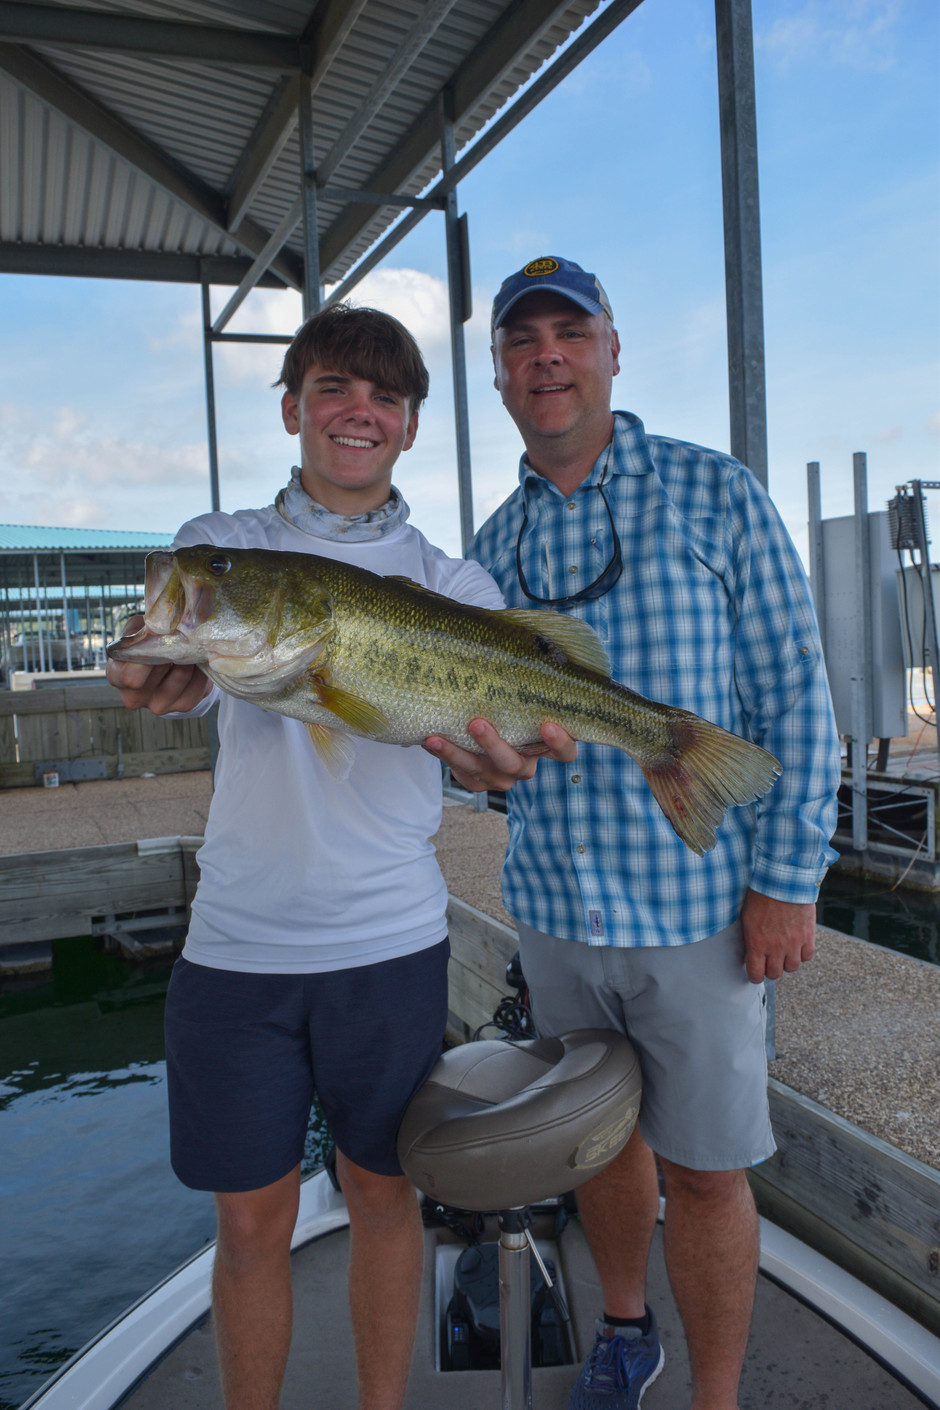 August 10th, Lake Travis Fishing Report (Plus Striper and Decker update)